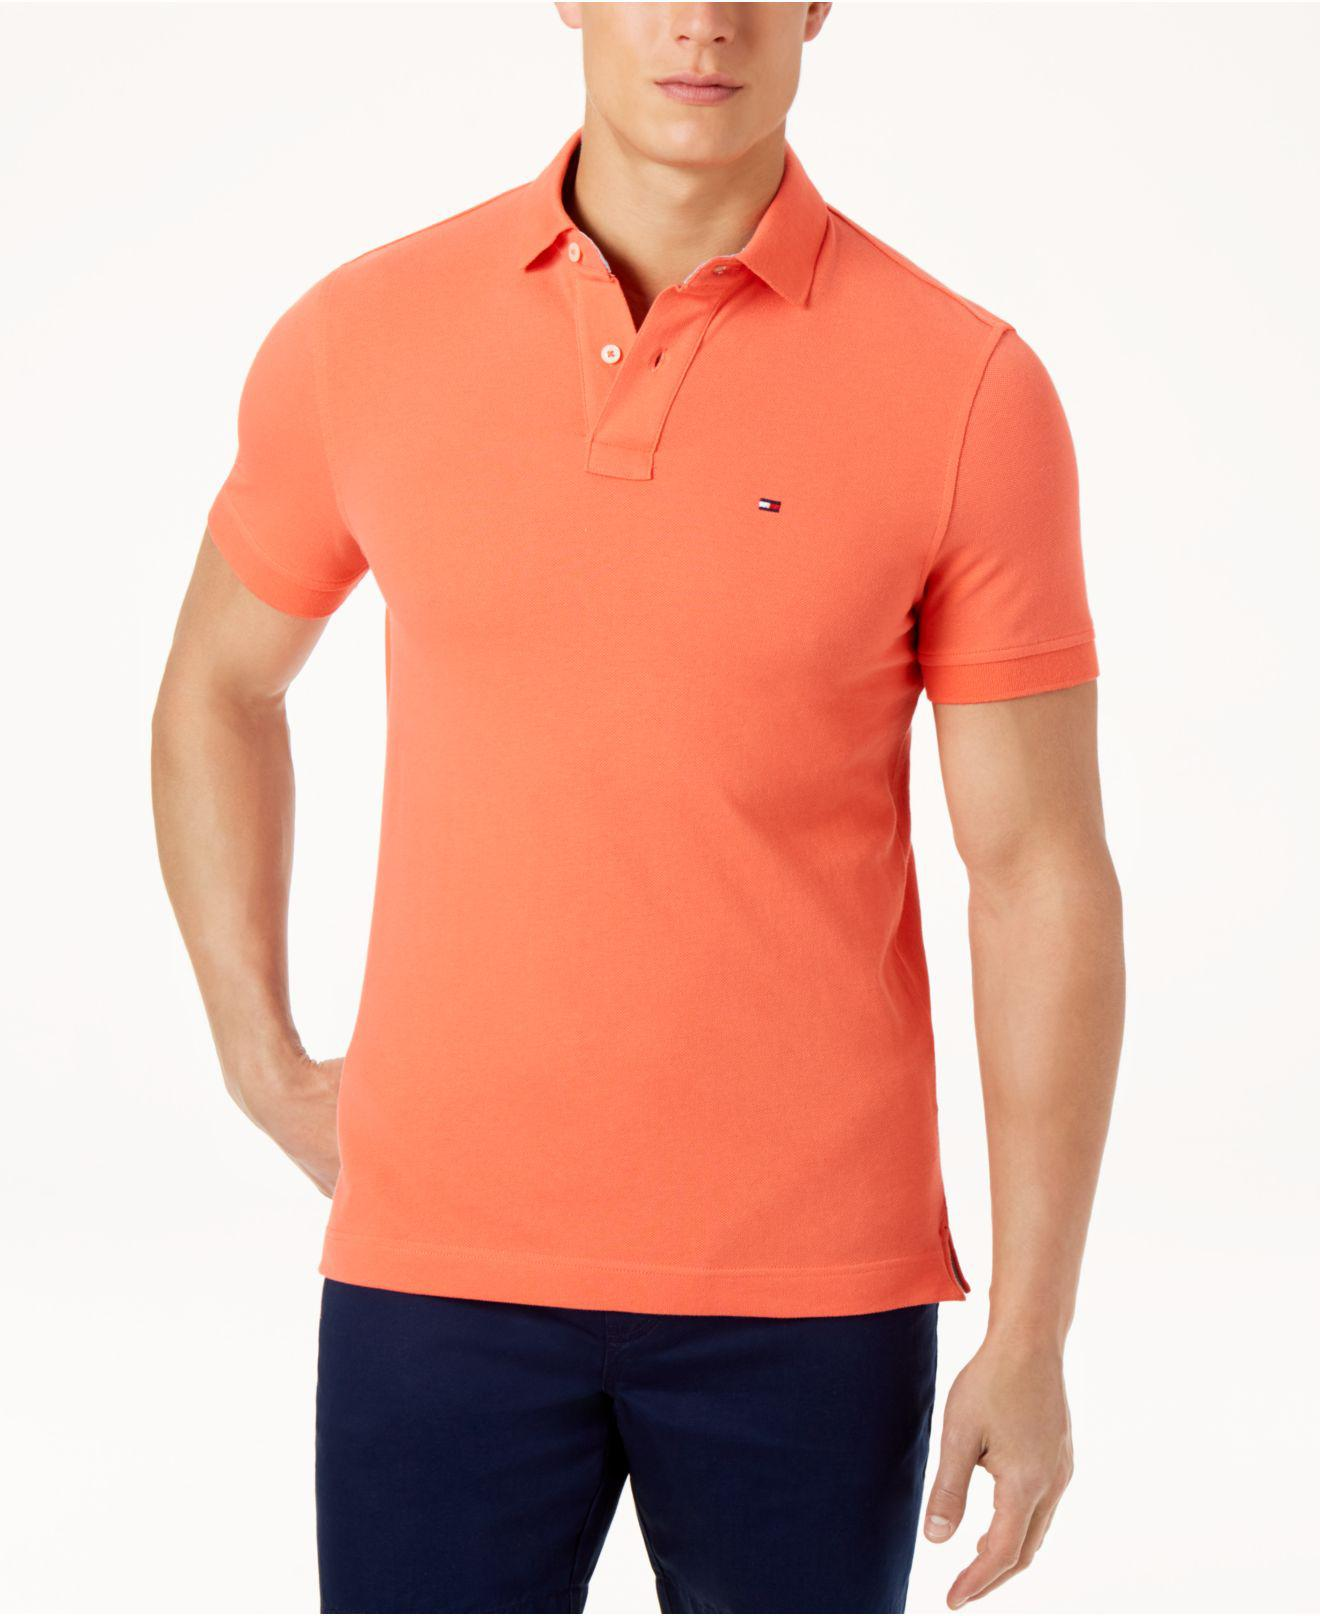 ea264ed65 Lyst - Tommy Hilfiger Custom-fit Ivy Polo in Orange for Men - Save 51%